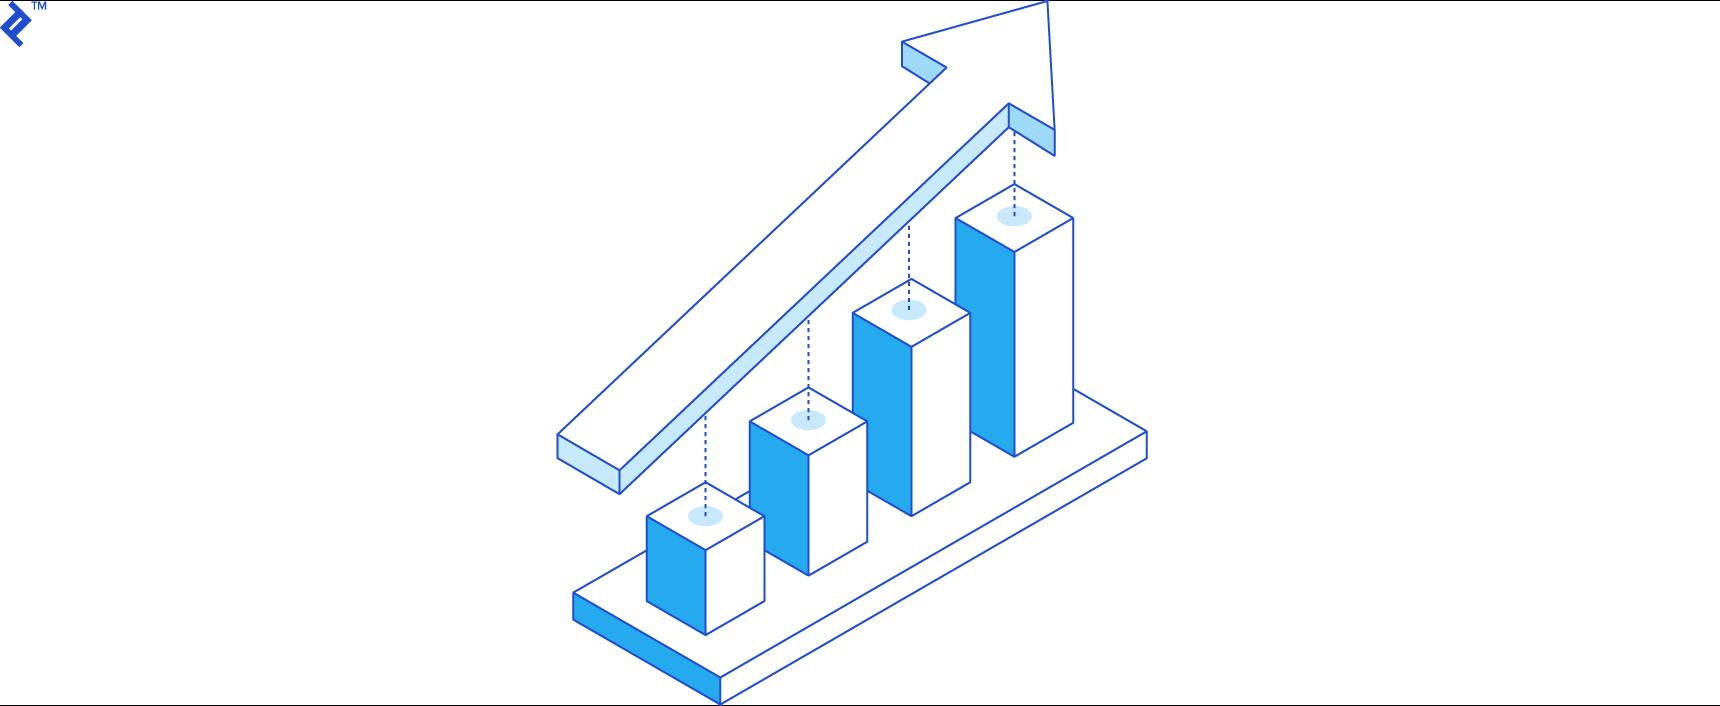 sales forecast upward growth